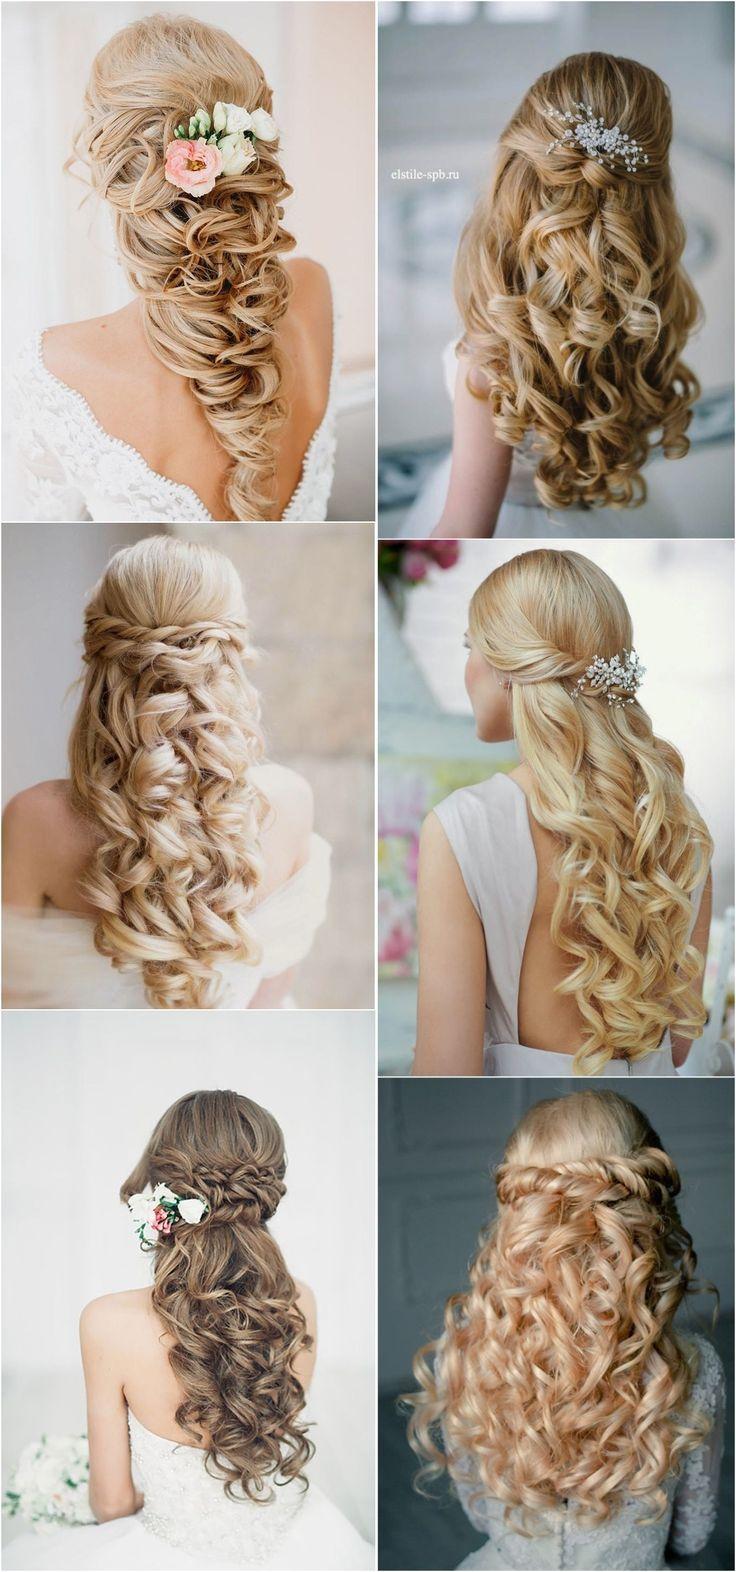 bridal hairstyles : 40 stunning half up half down wedding